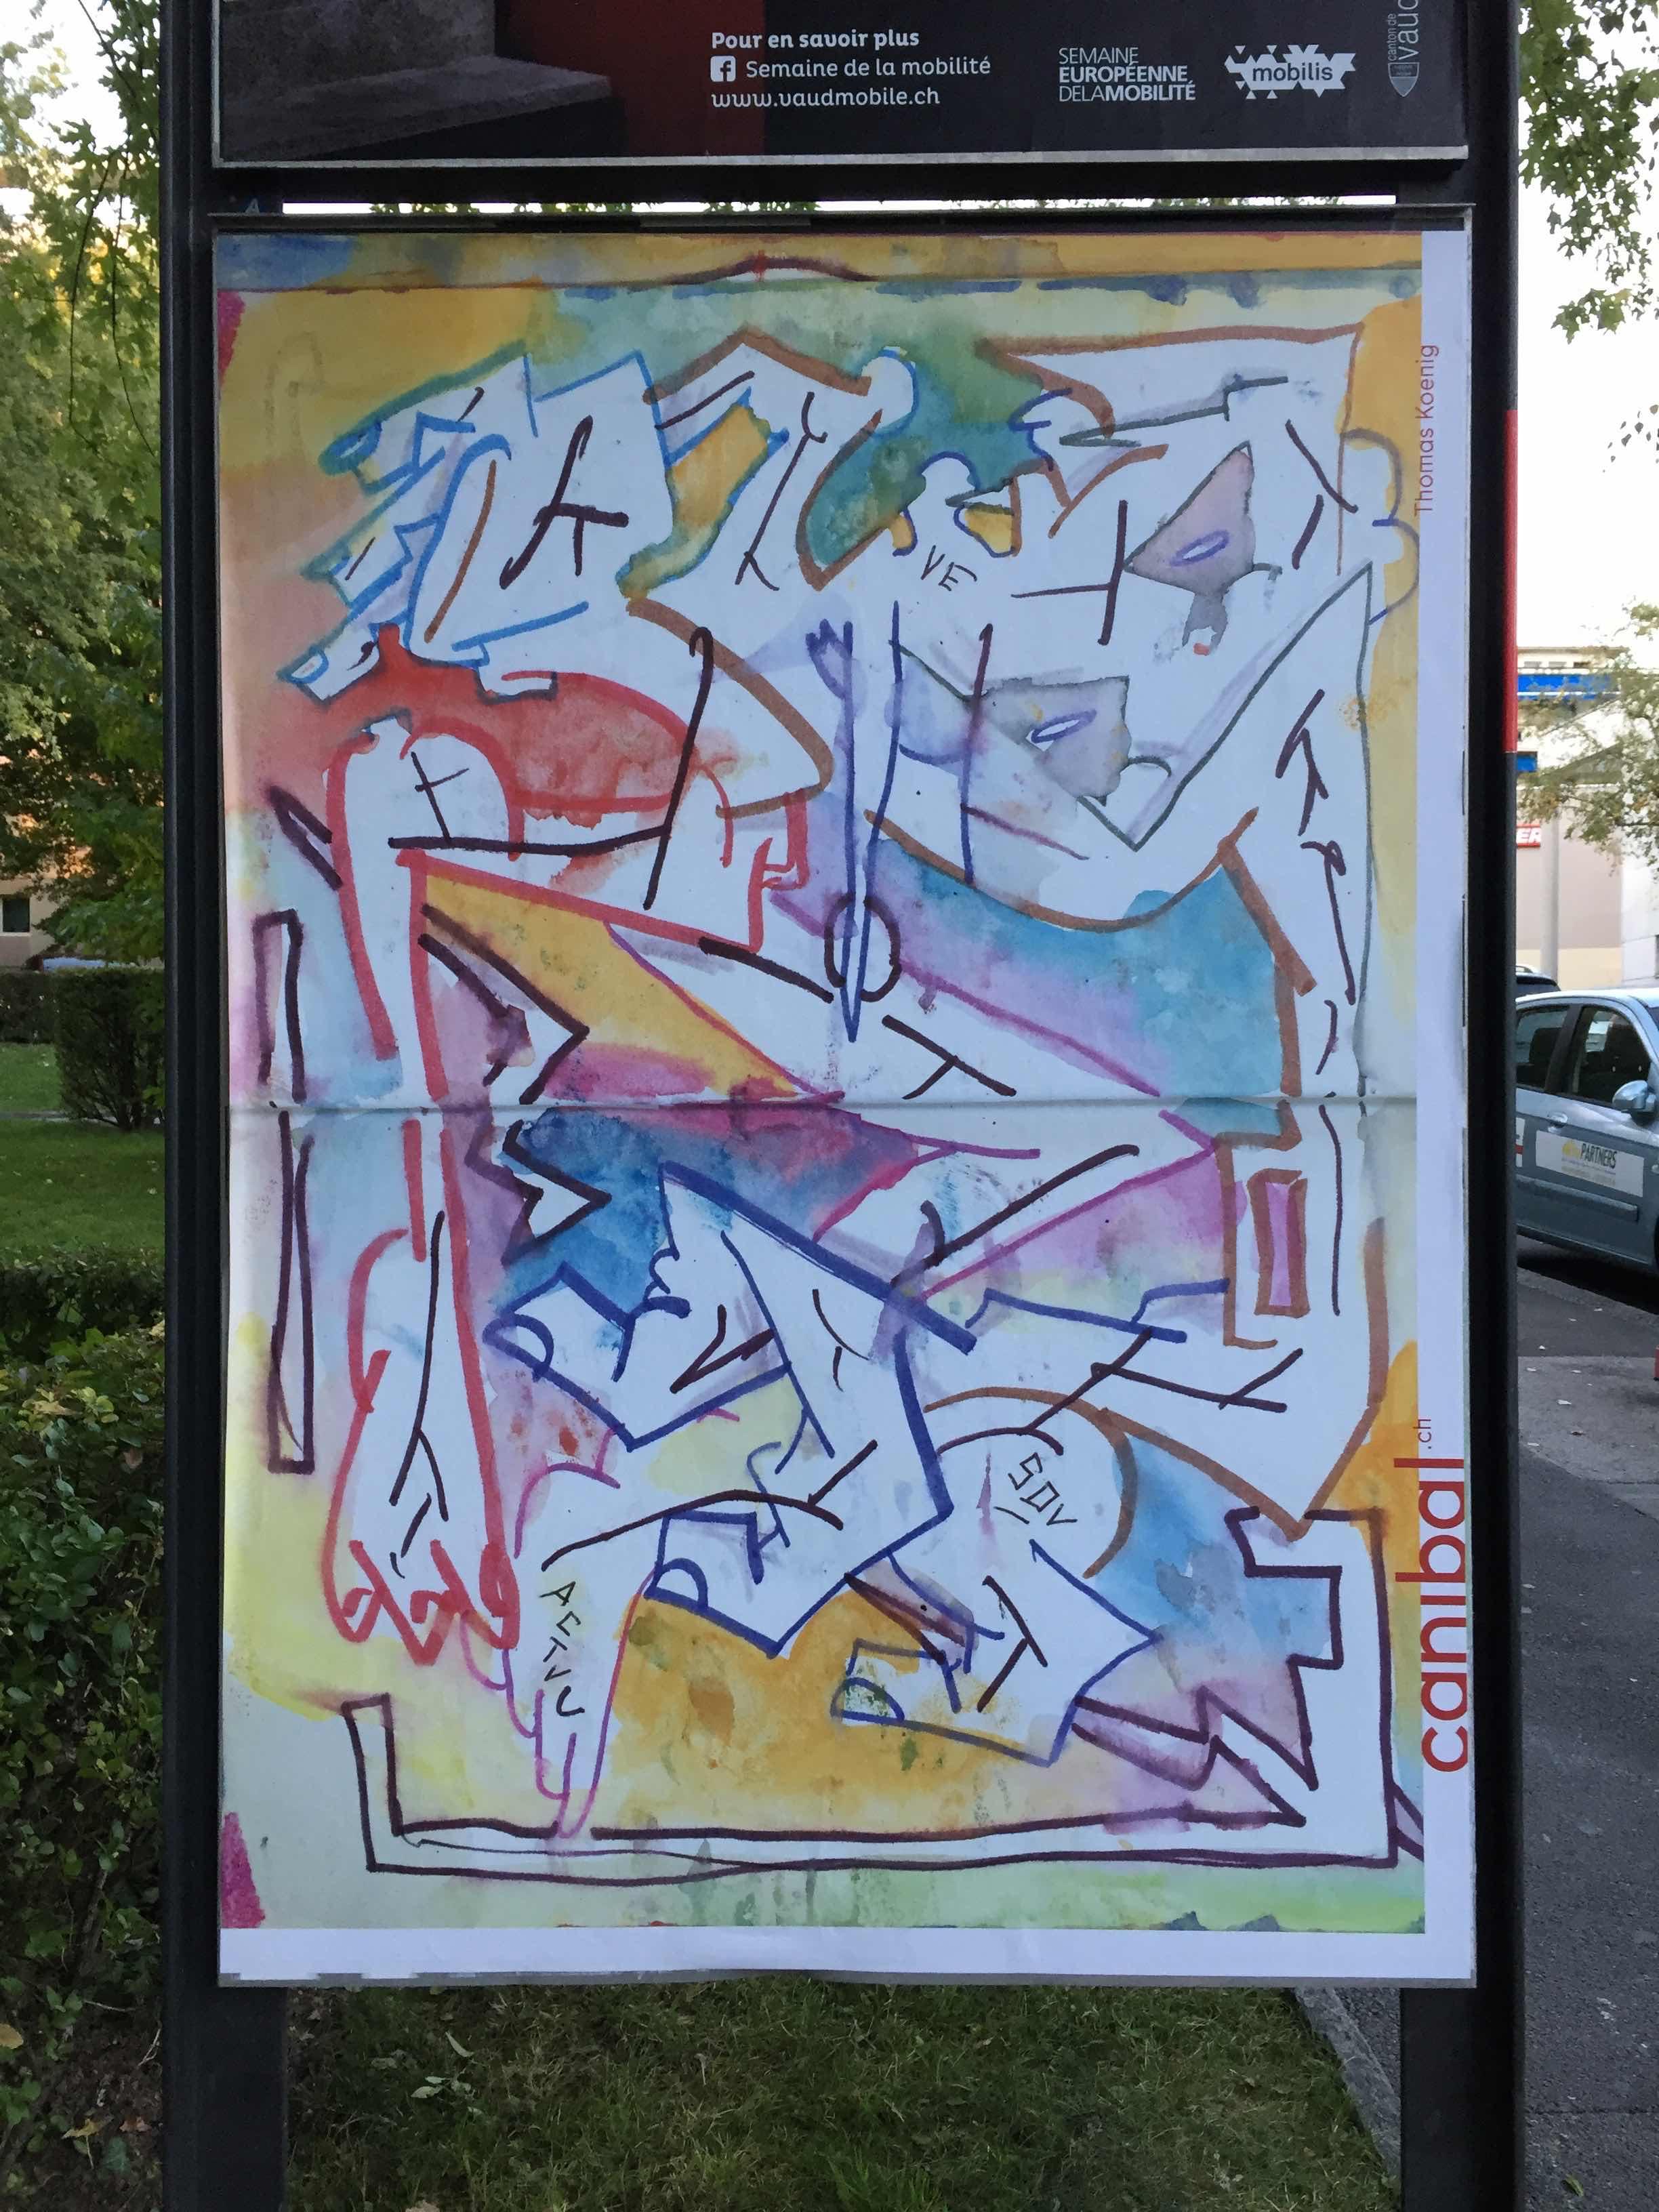 Thomas Koenig, chemin d'entre-bois 11, Lausanne-IMG_6040